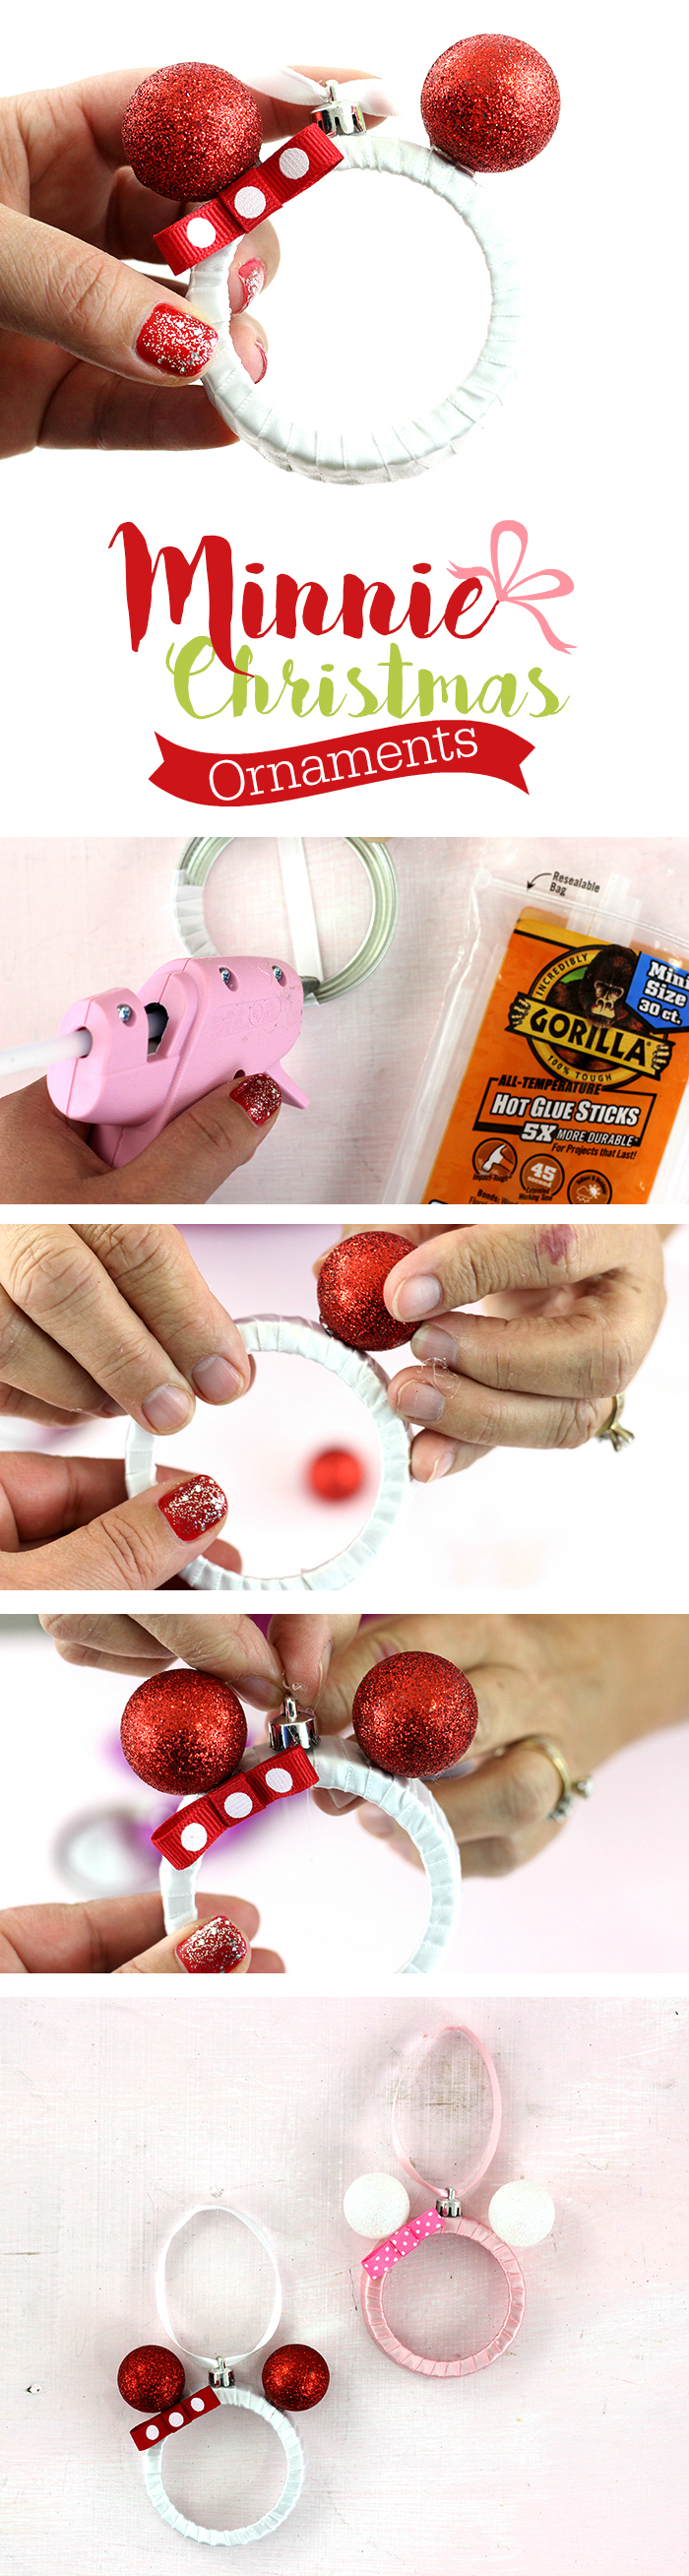 Mickey and Minnie DIY Christmas Ornaments. Make them with Mason Jar Lids. So stinking cute!